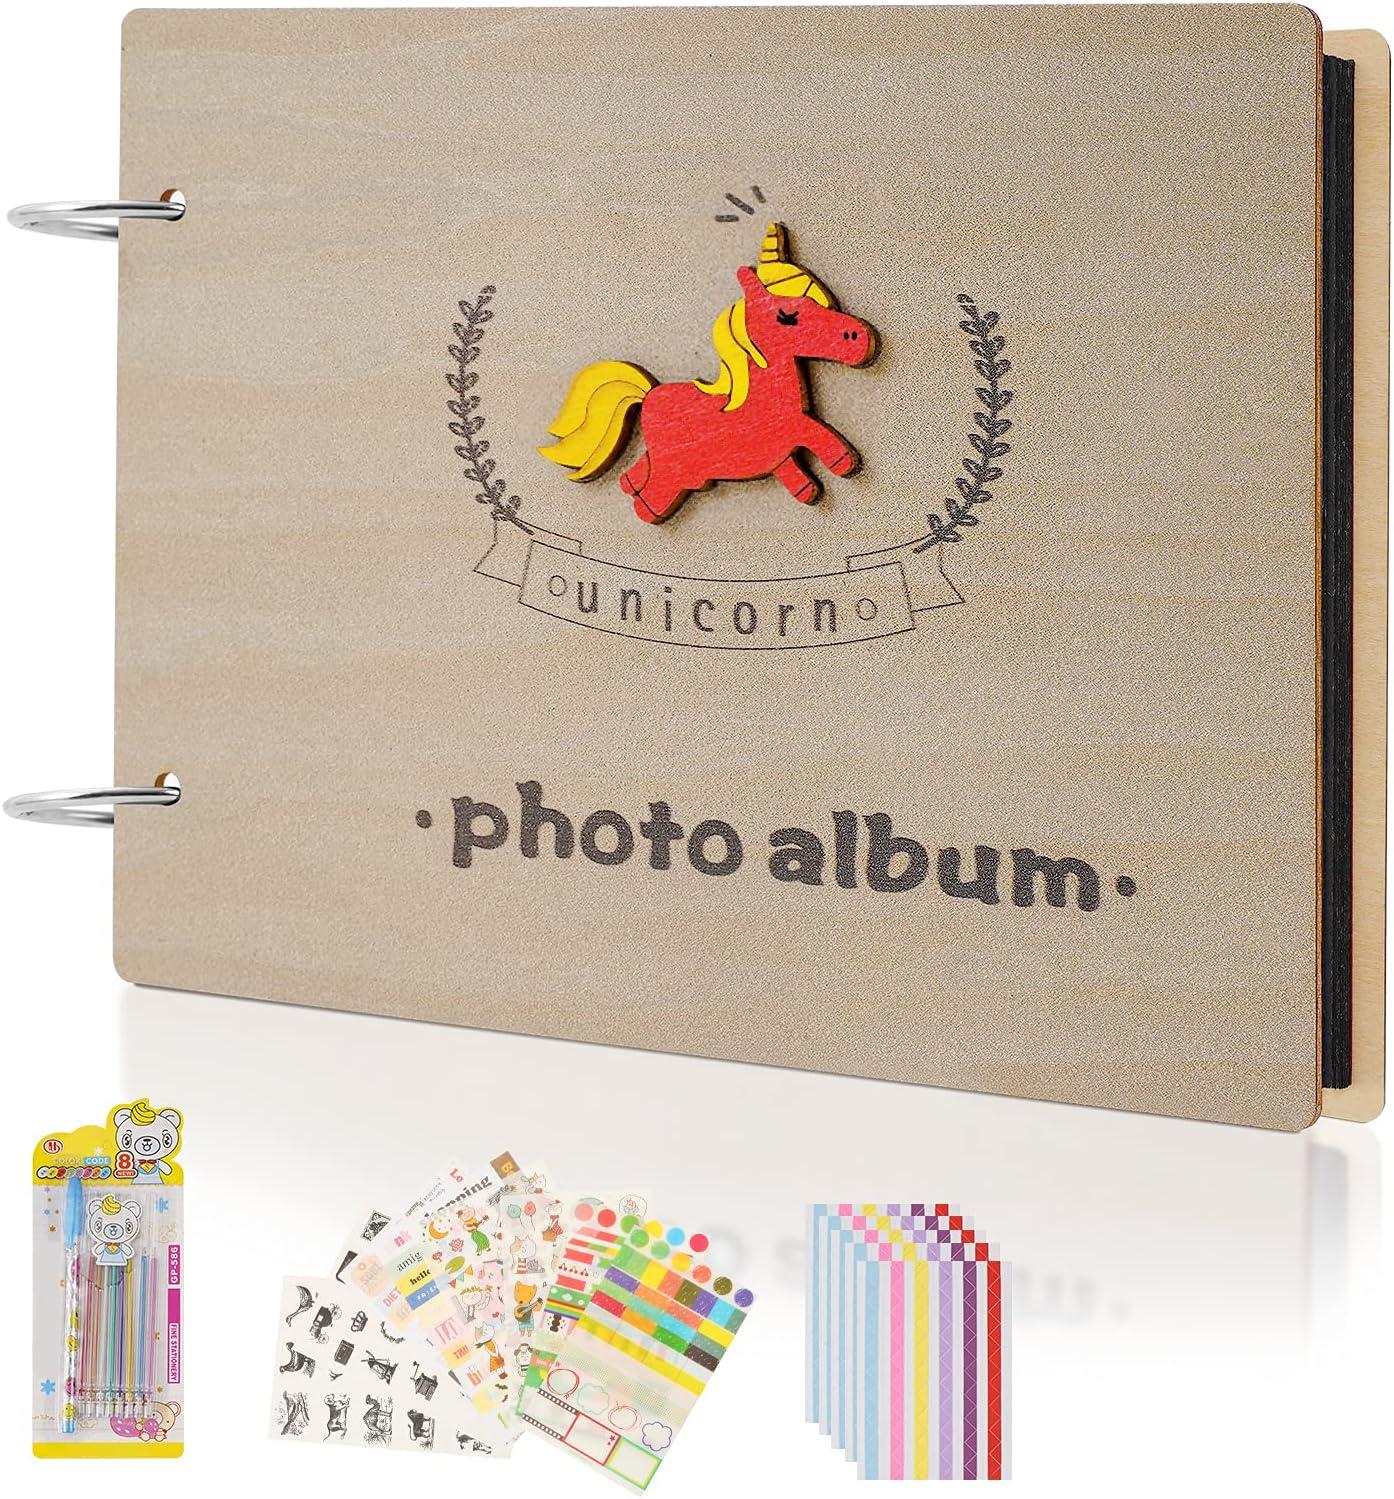 BIKIWO Photo Album Branded goods Scrapbook 60 Pages Paper Black Wooden Max 57% OFF Cover